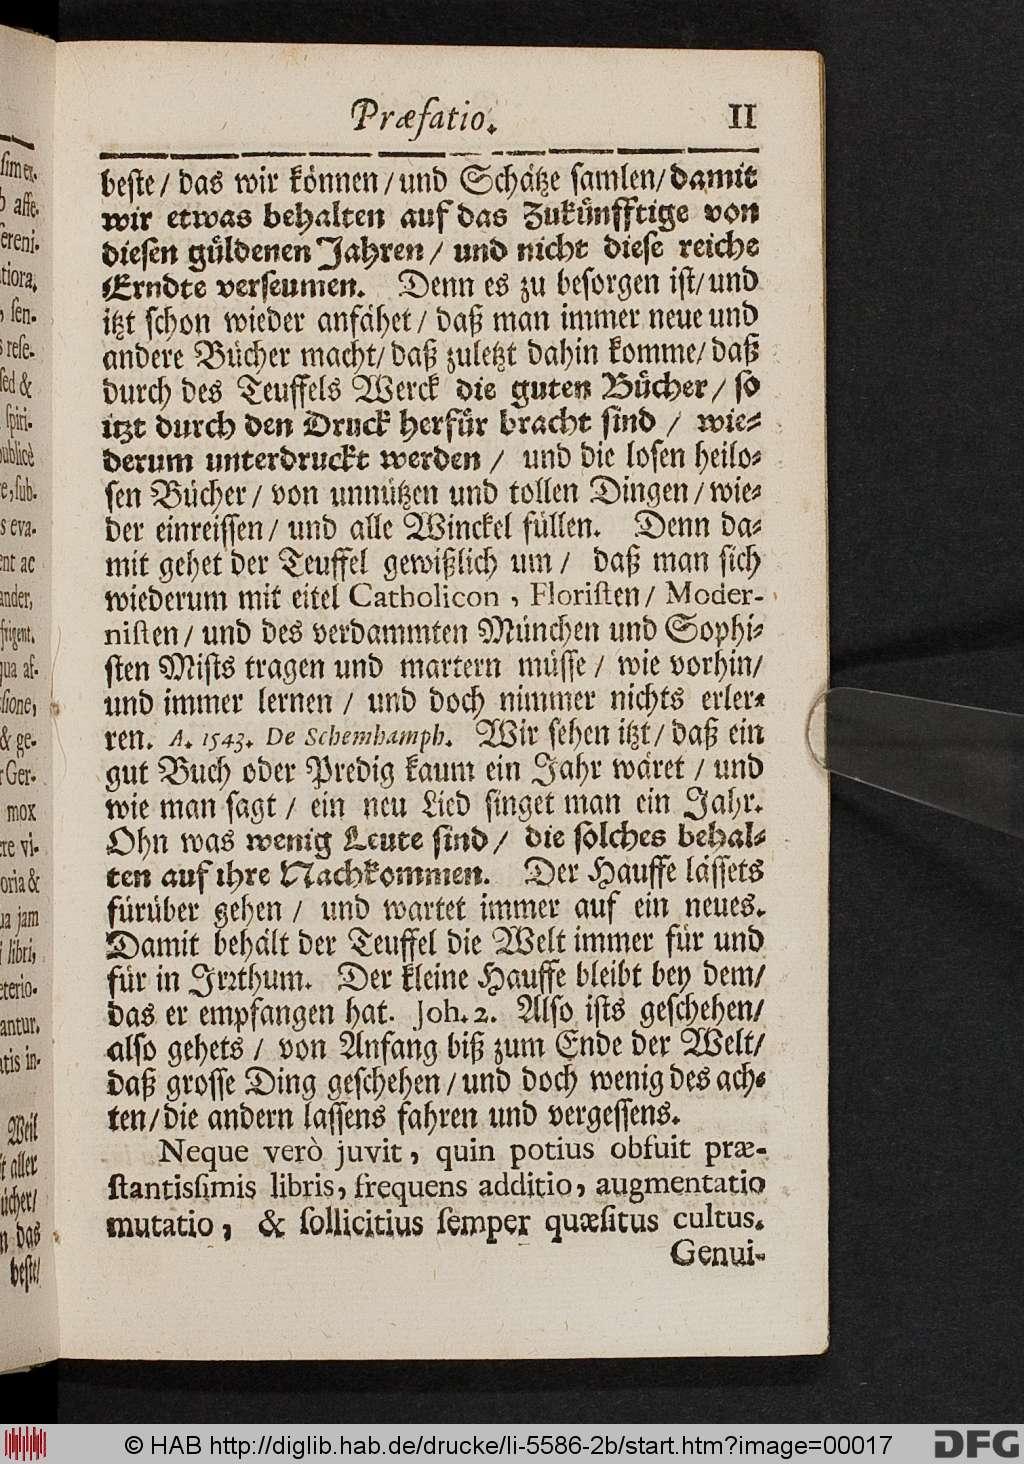 http://diglib.hab.de/drucke/li-5586-2b/00017.jpg